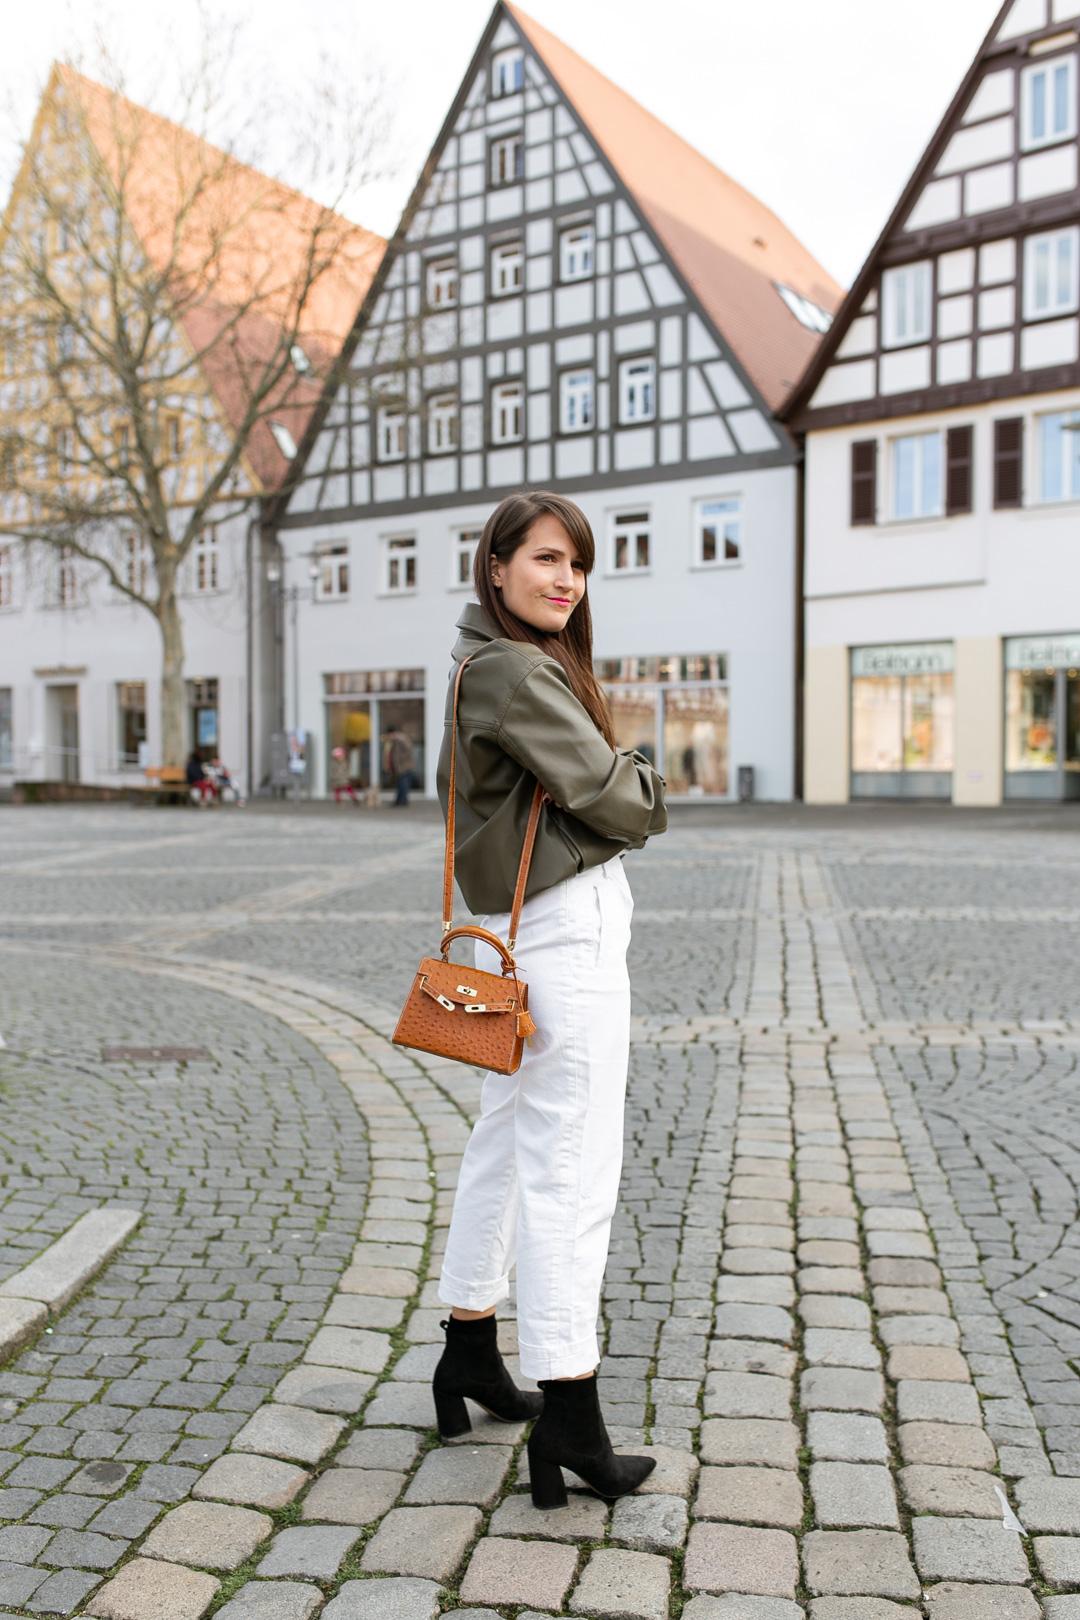 Lederhemd stylen - Pieces of Mariposa / Fashion & Lifestyle Blog aus Nürnberg